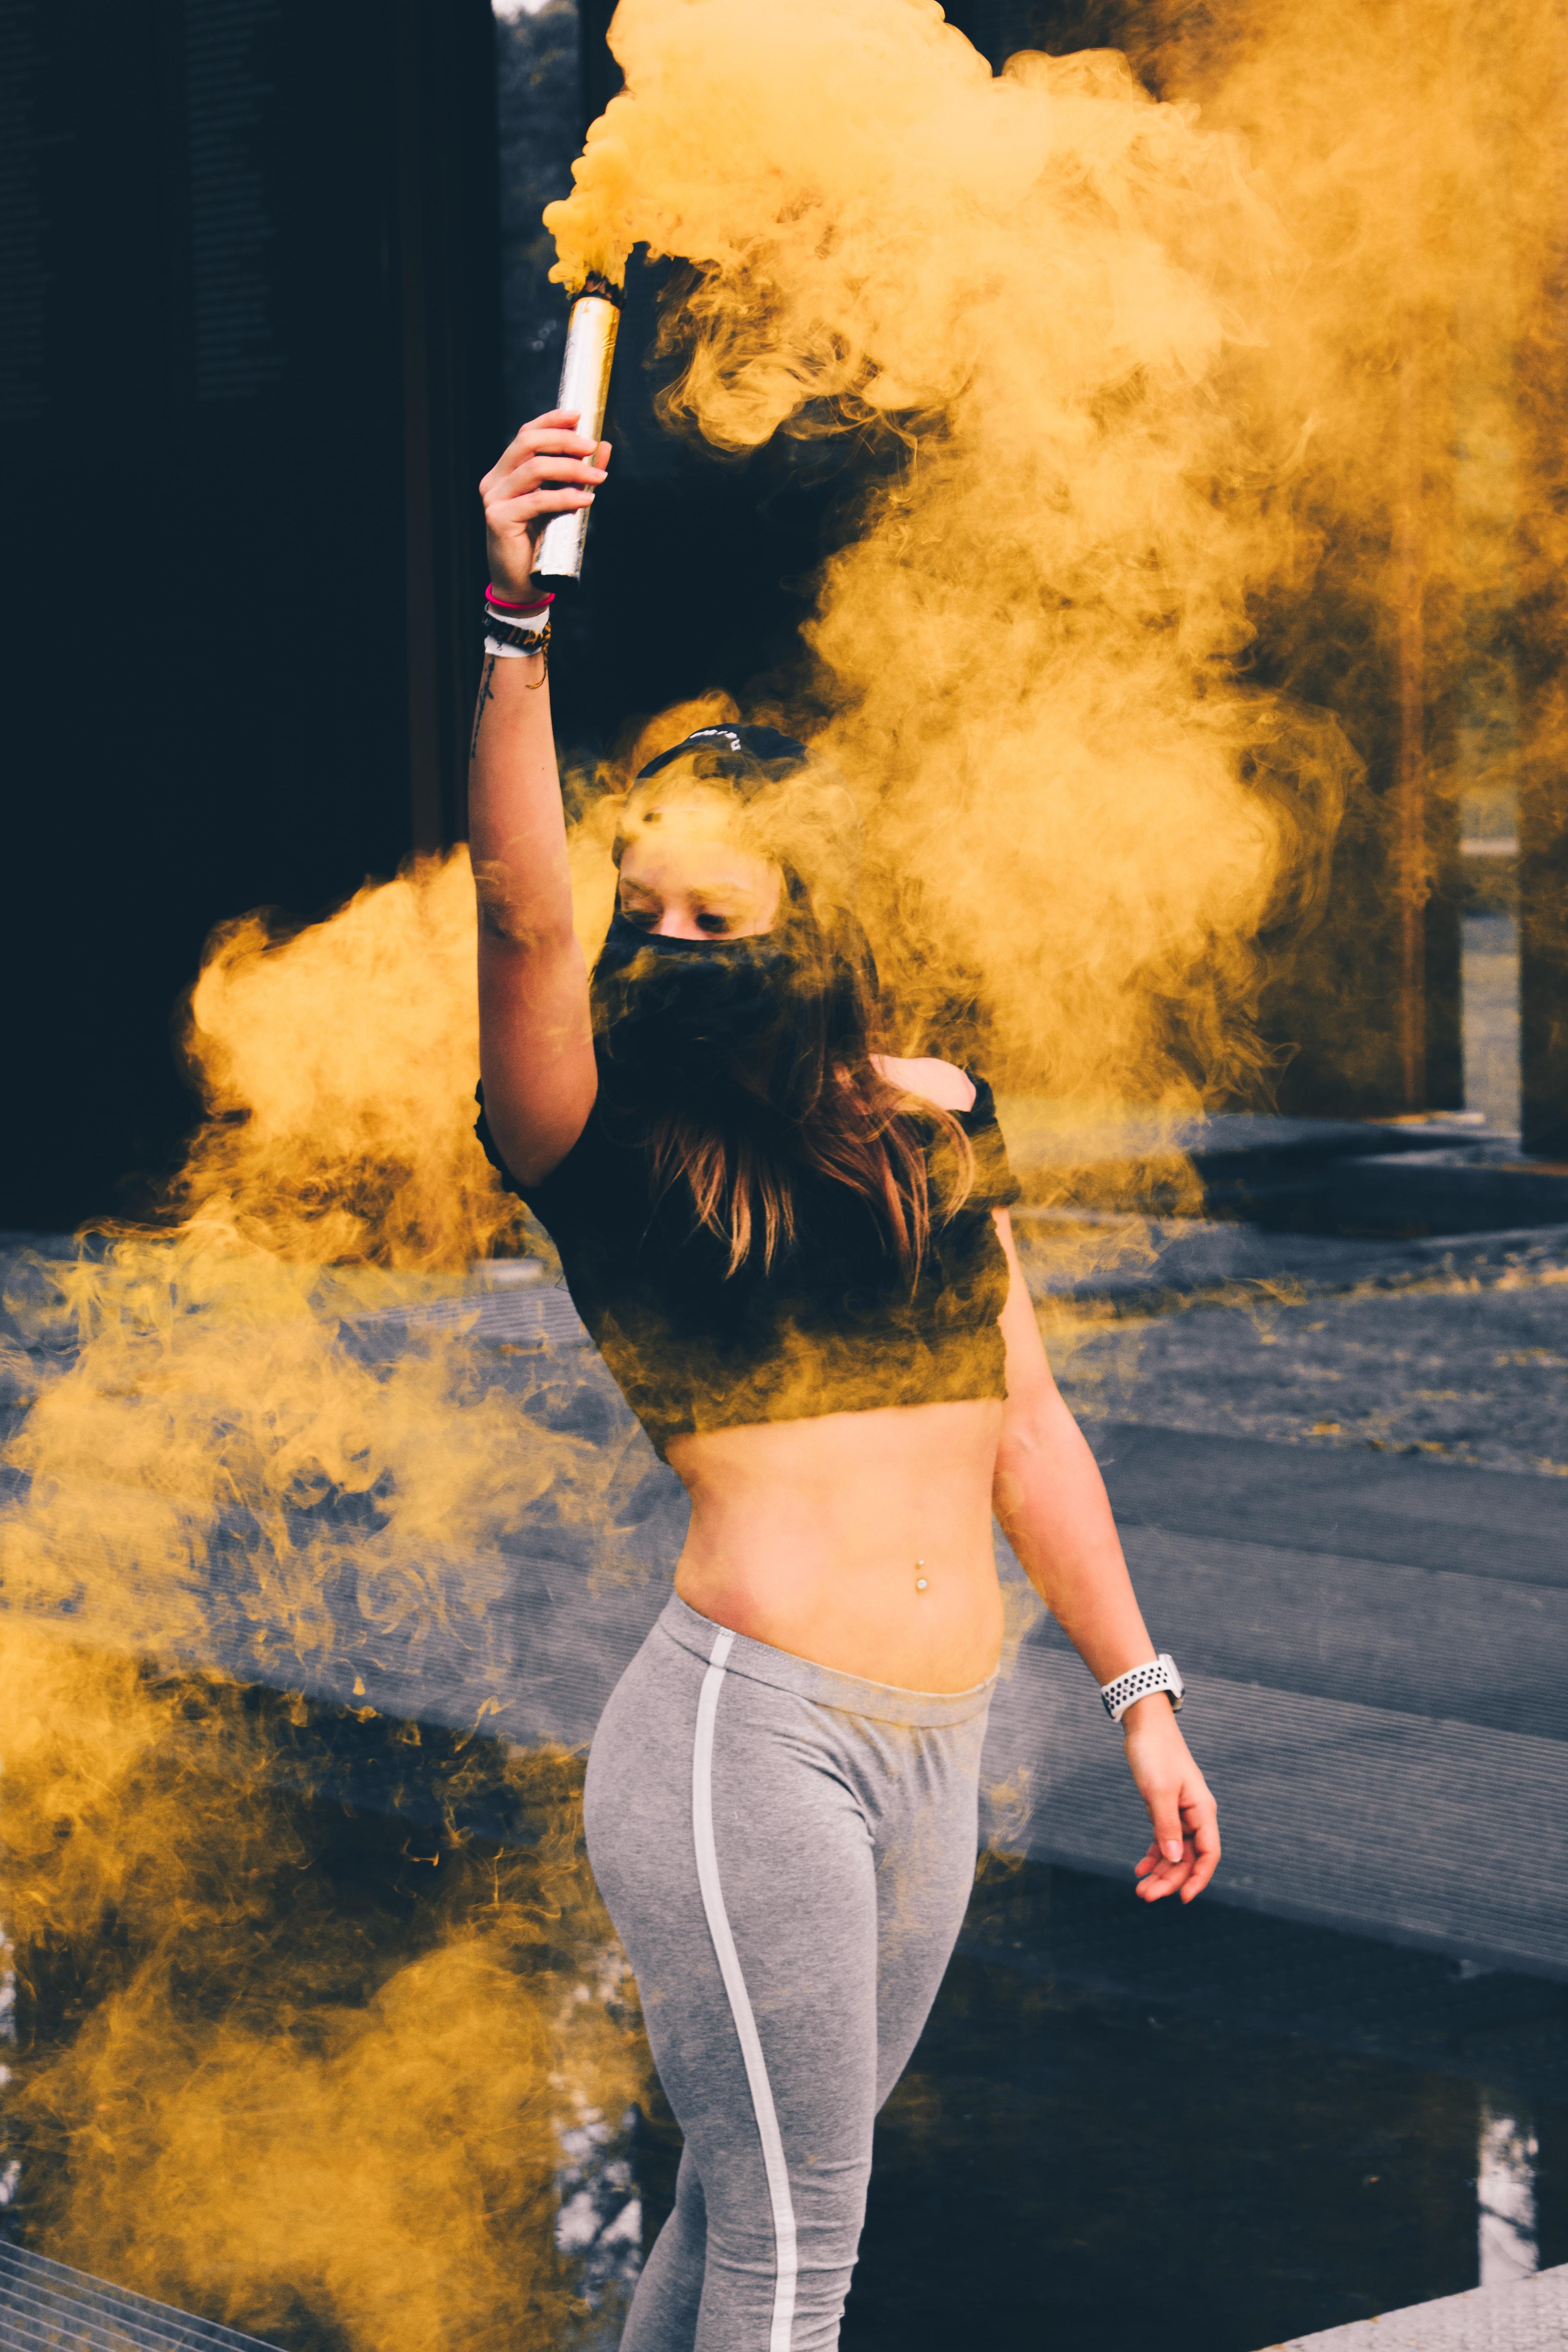 macro photography of woman wearing mask while raising smoke bomb